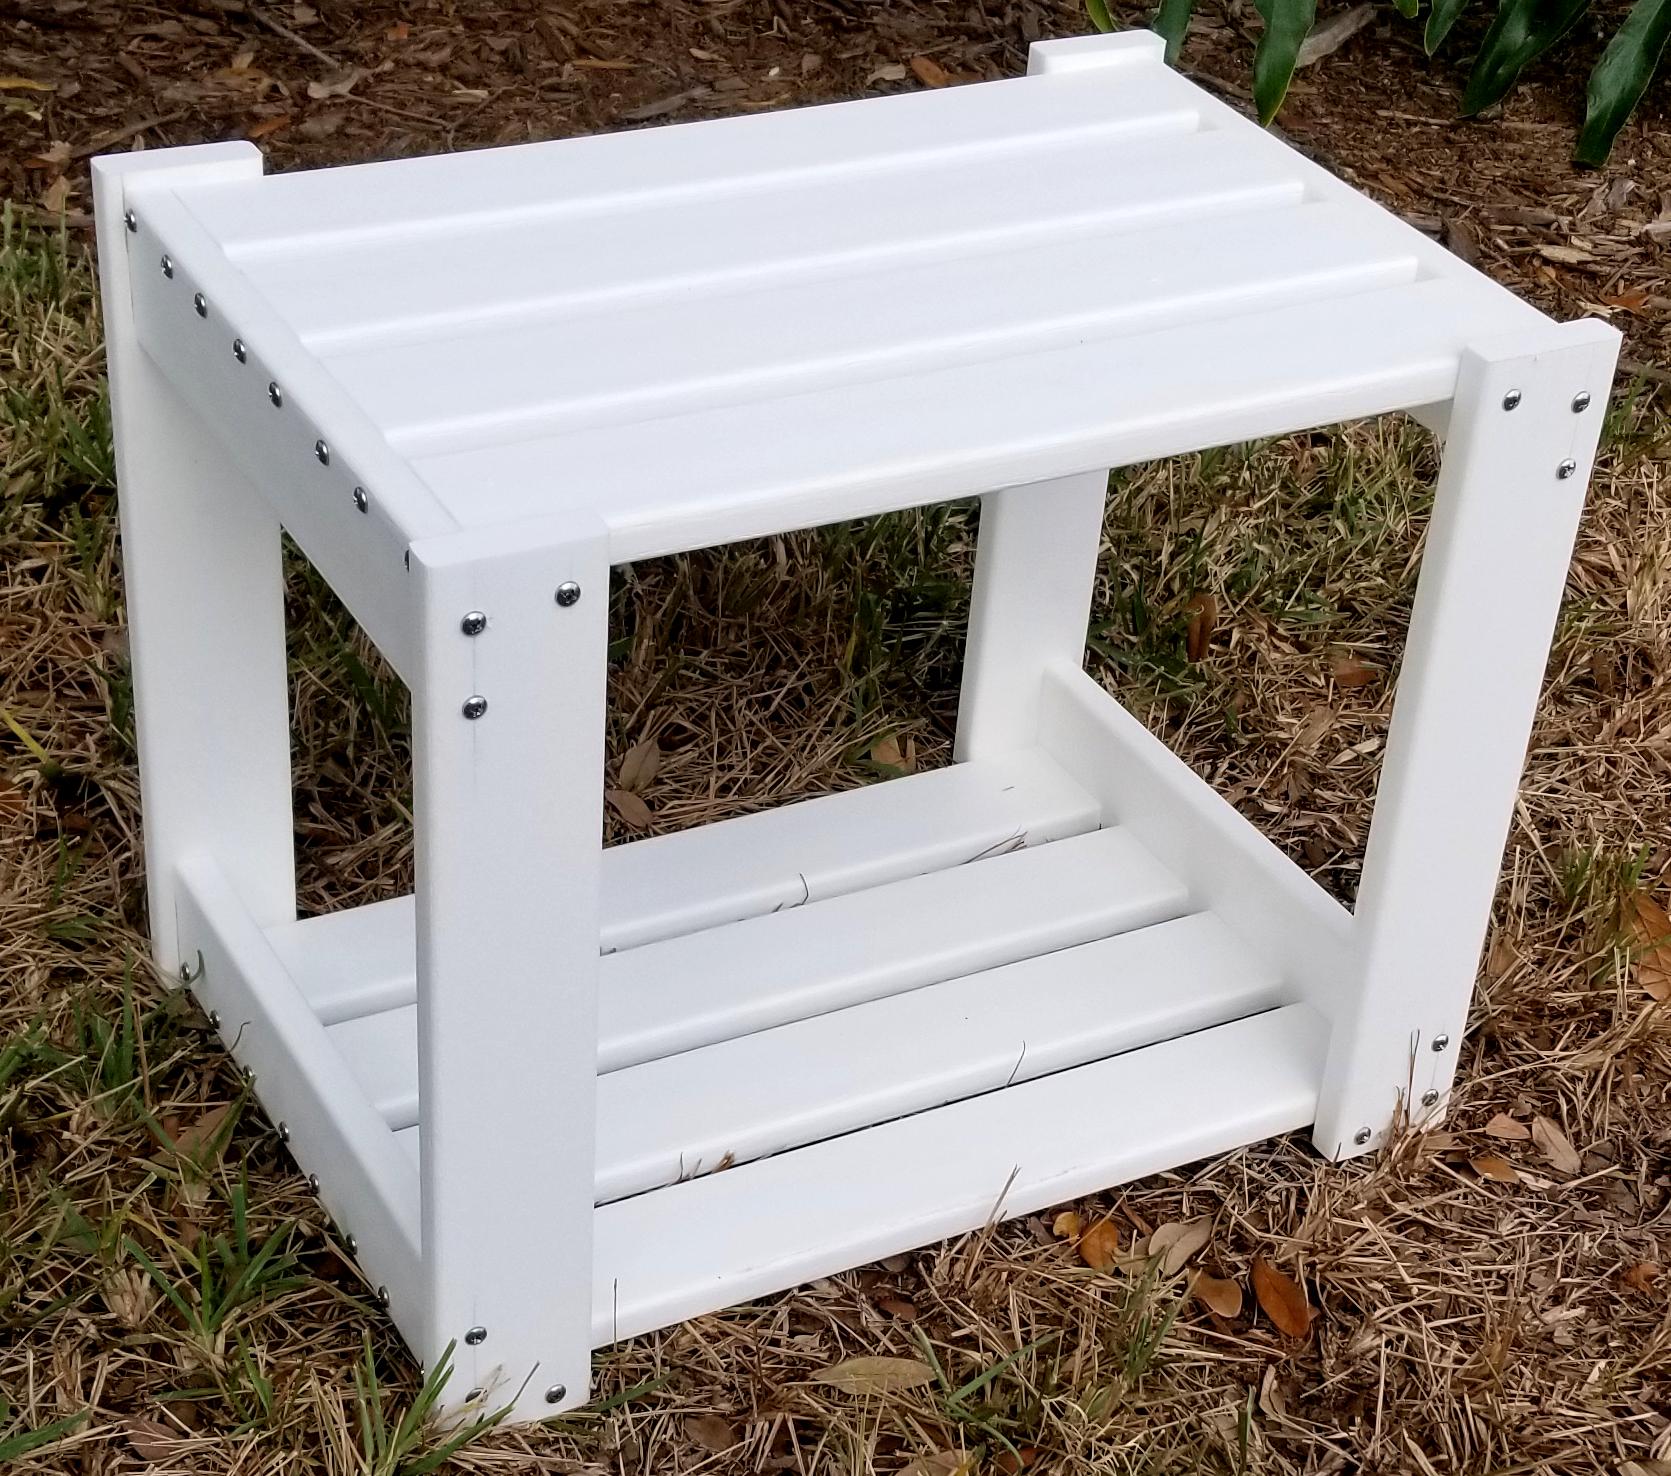 Patio Furniture Refinishing South Florida: Florida Patio: Outdoor Patio